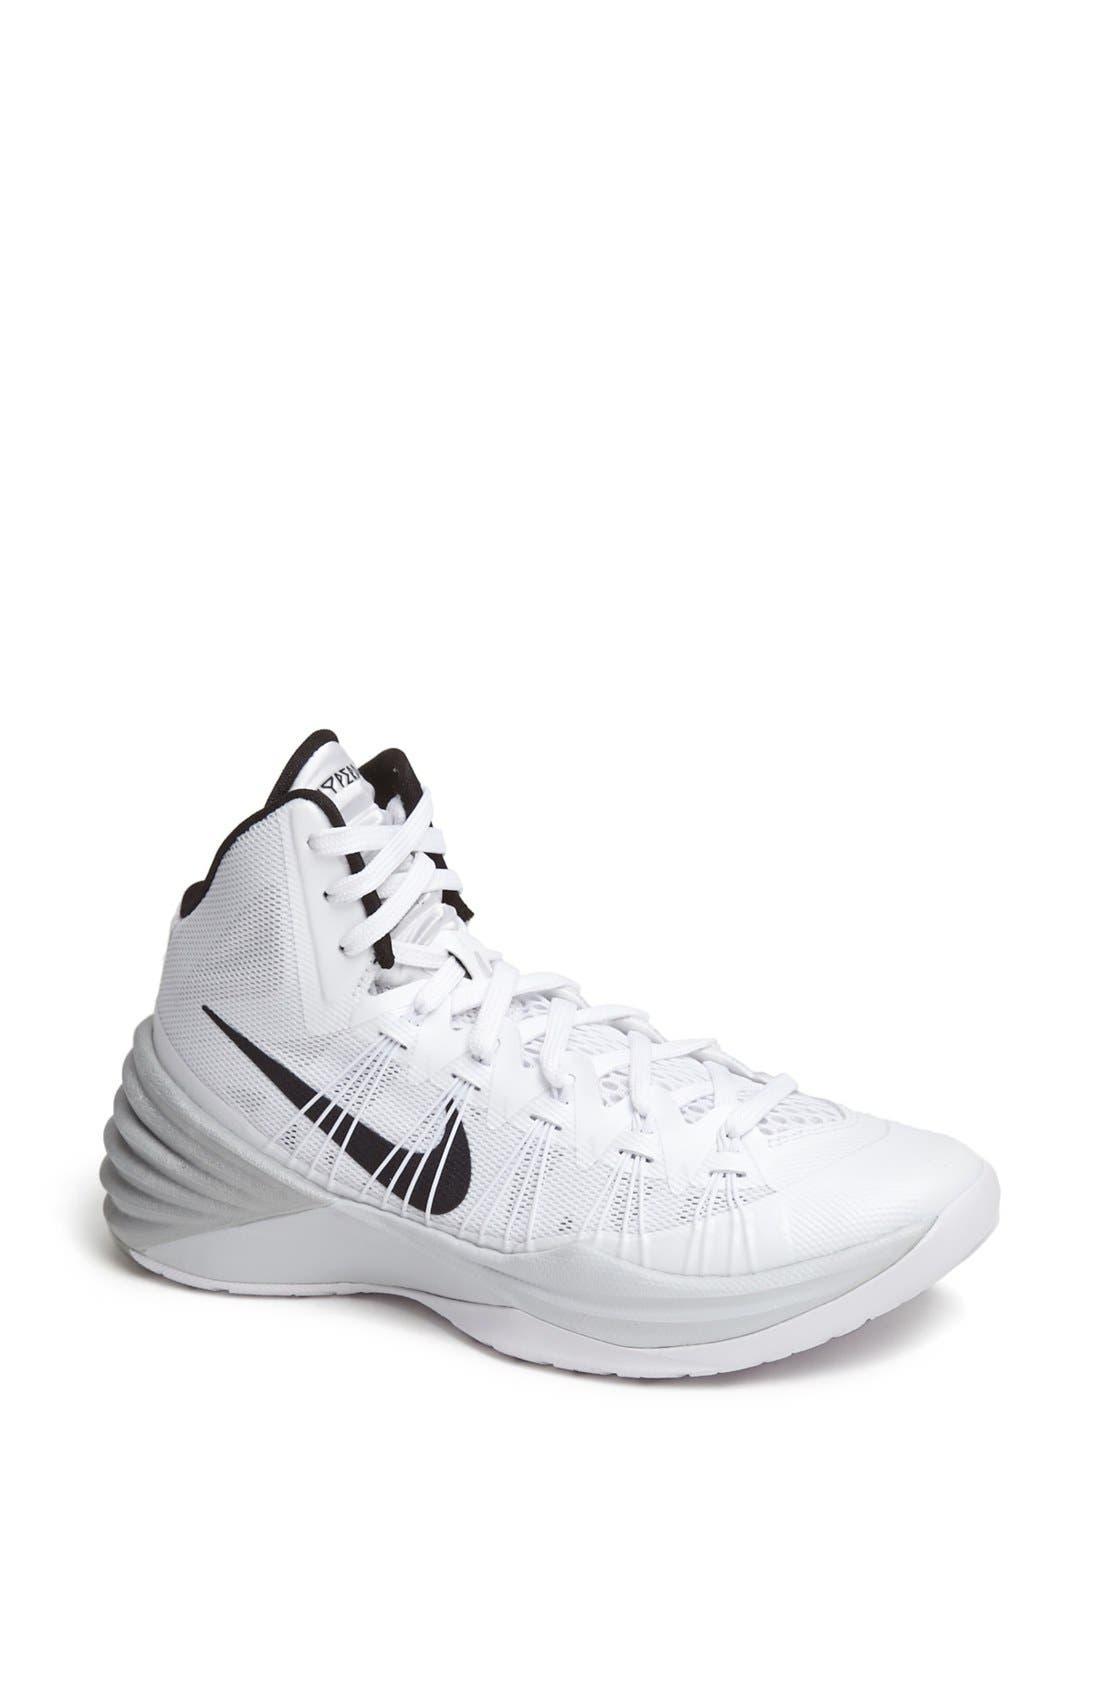 Alternate Image 1 Selected - Nike 'Hyperdunk' Basketball Shoe (Women)